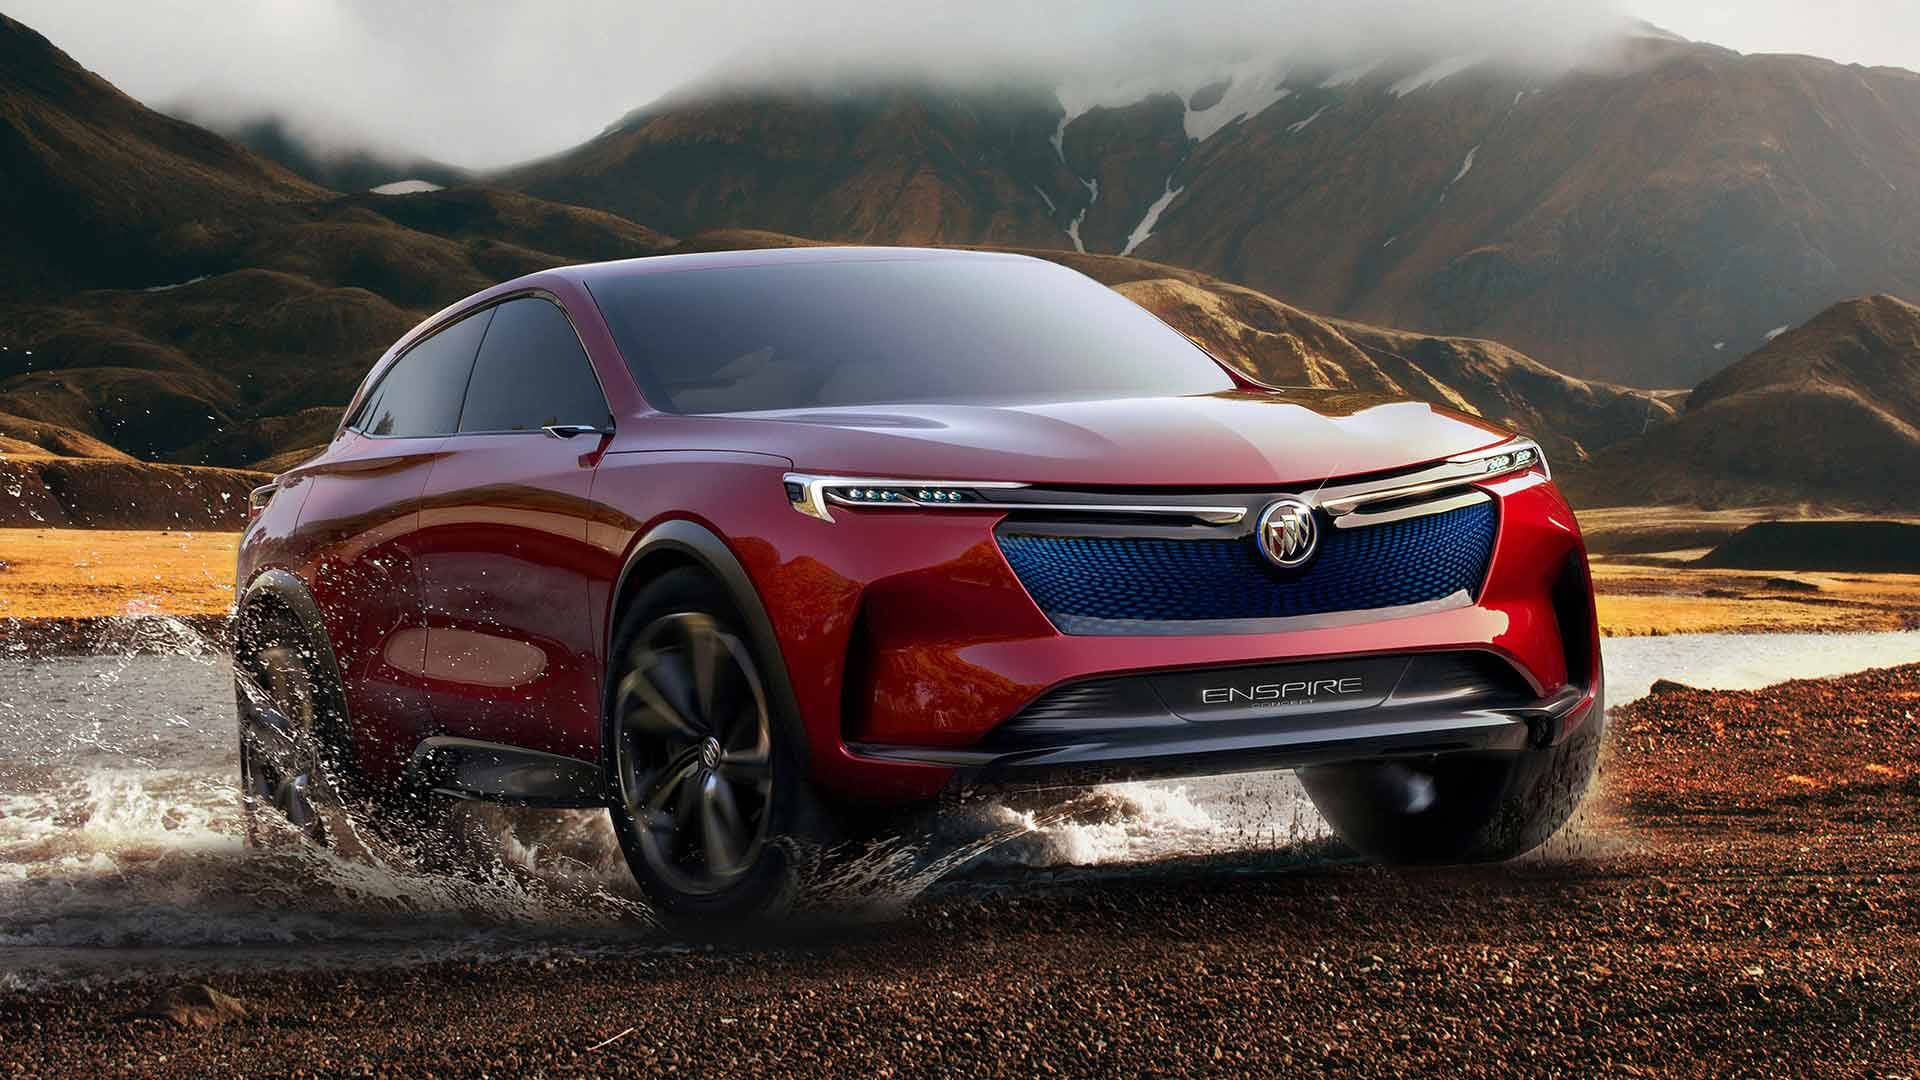 Buick презентовал электрический кроссовер Enspire